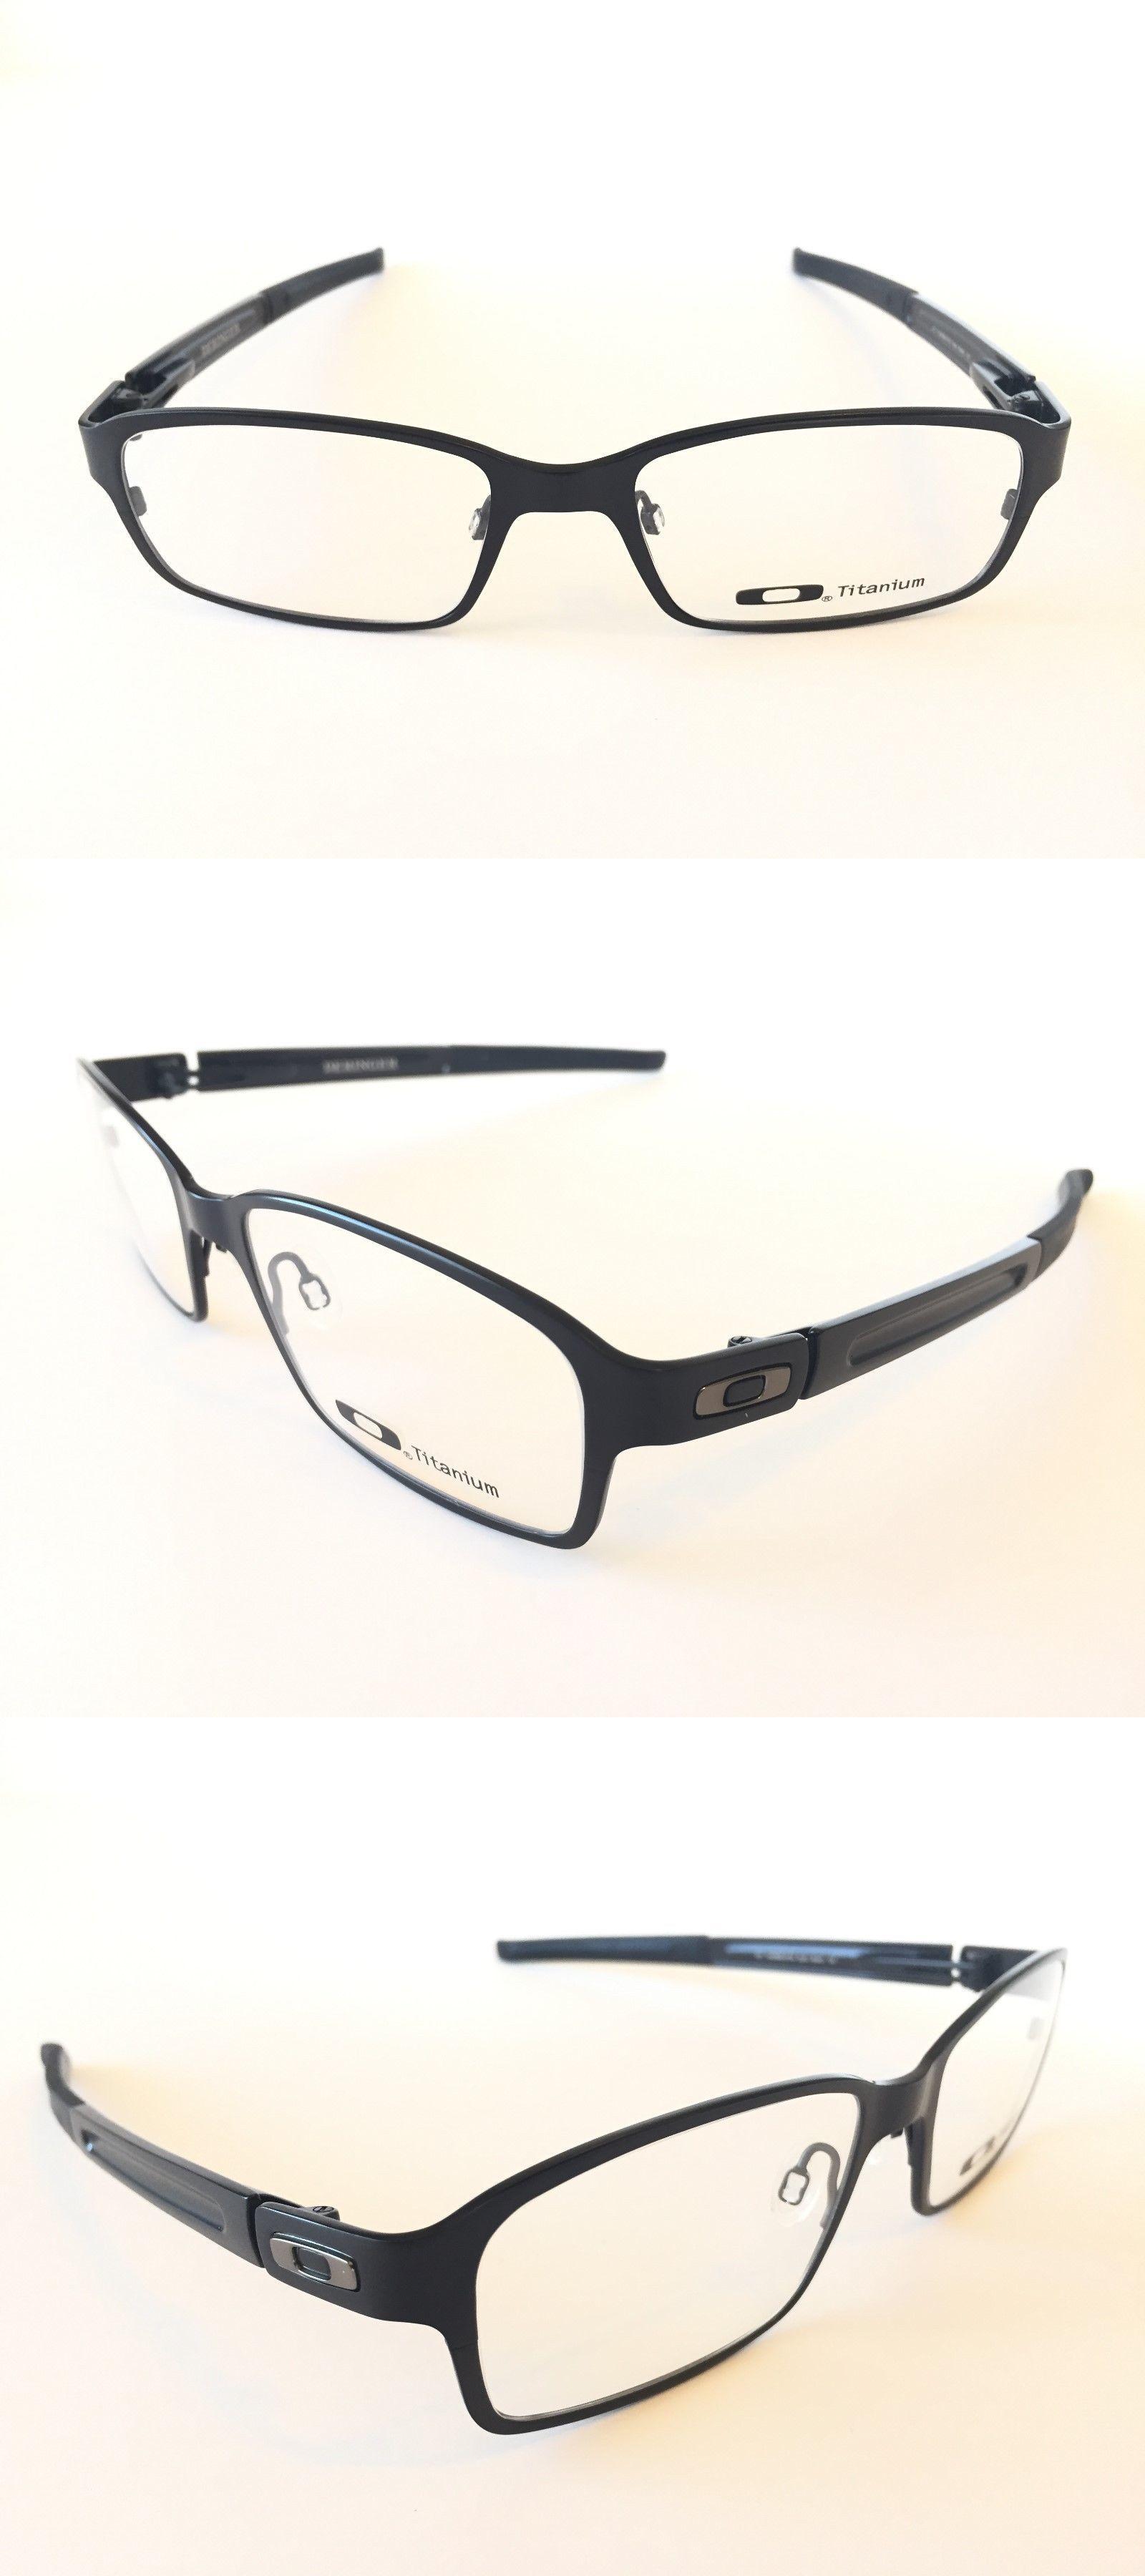 Prescription oakley glasses deringer recommend to wear in autumn in 2019